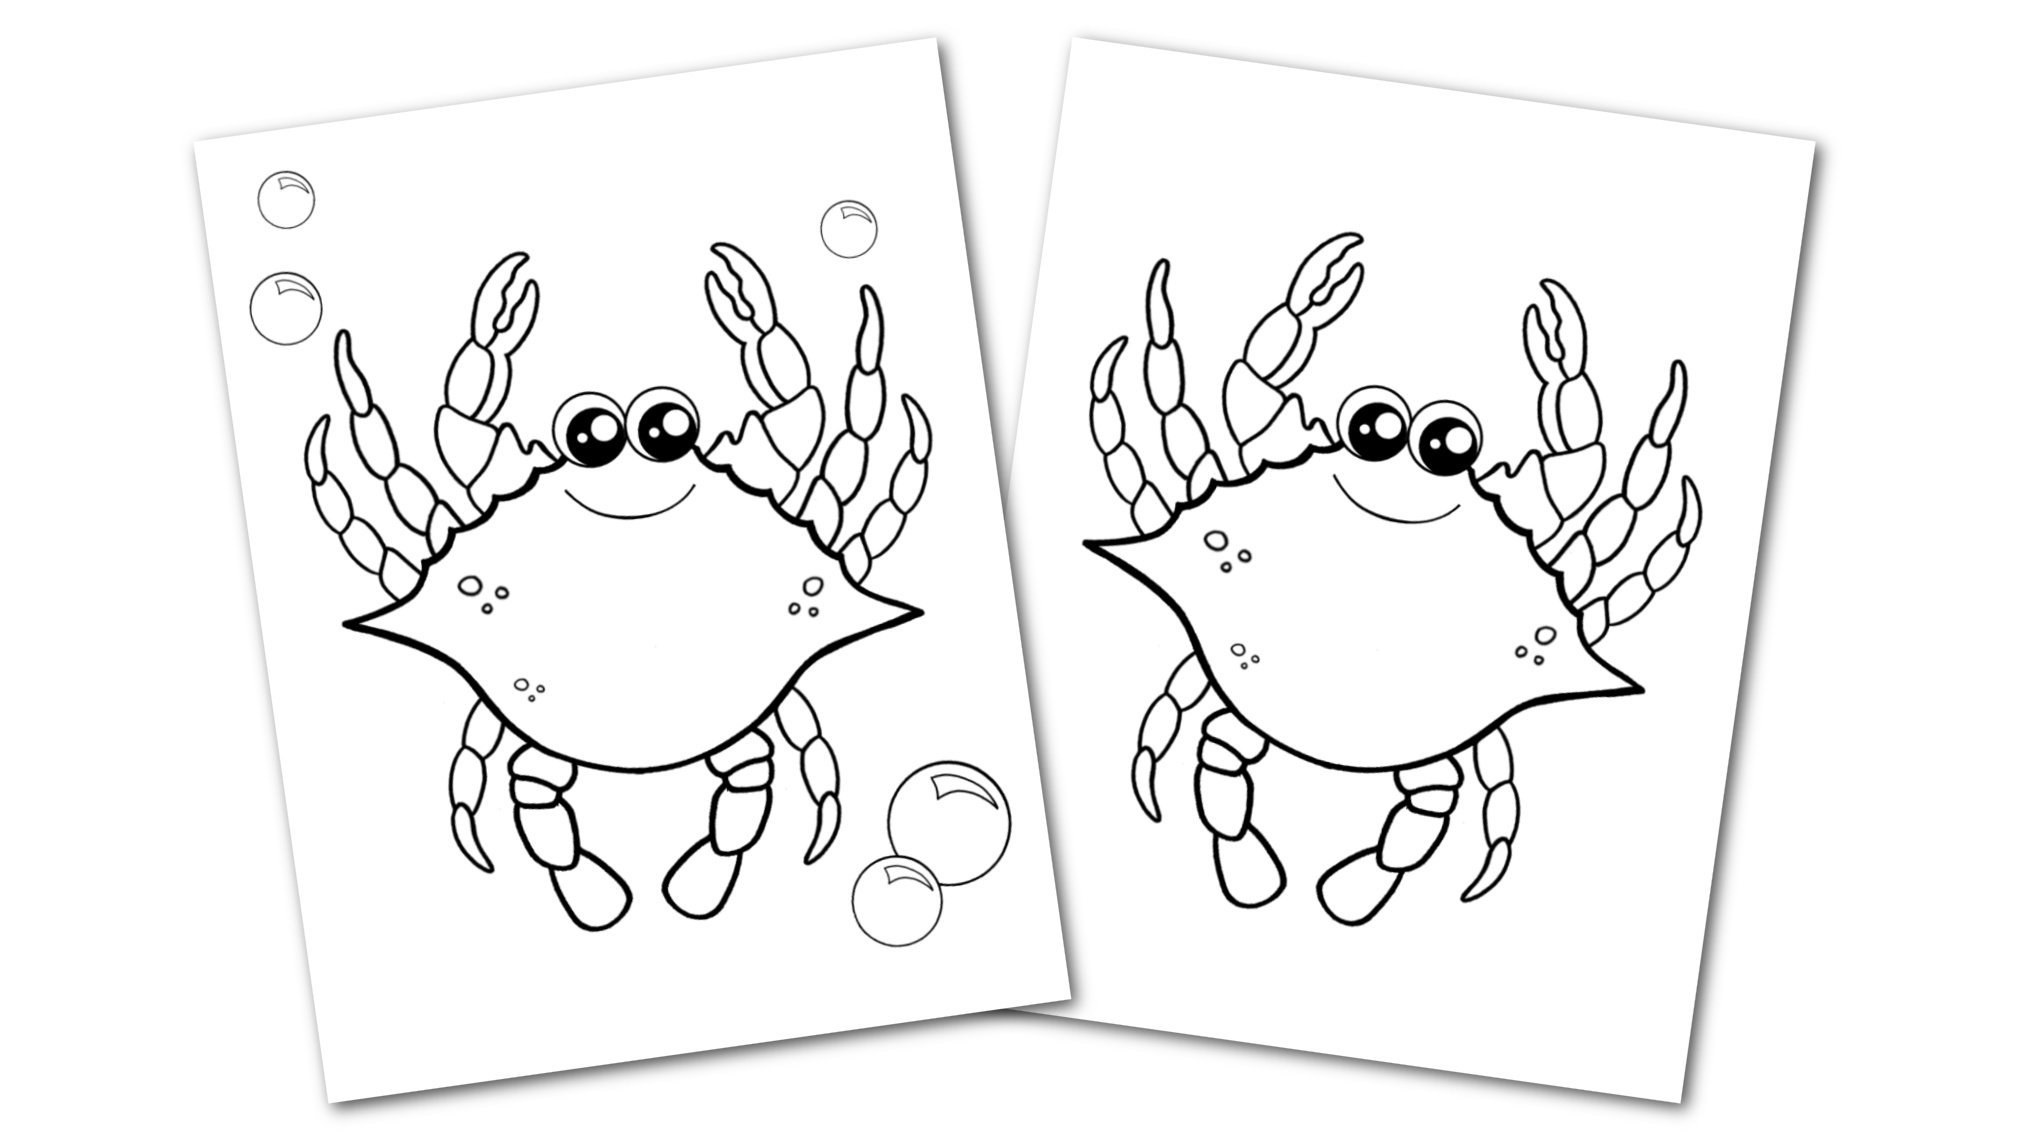 Free Printable Blue Crab Ocean Animal Convertkit for Toddlers, Kids and Preschoolers